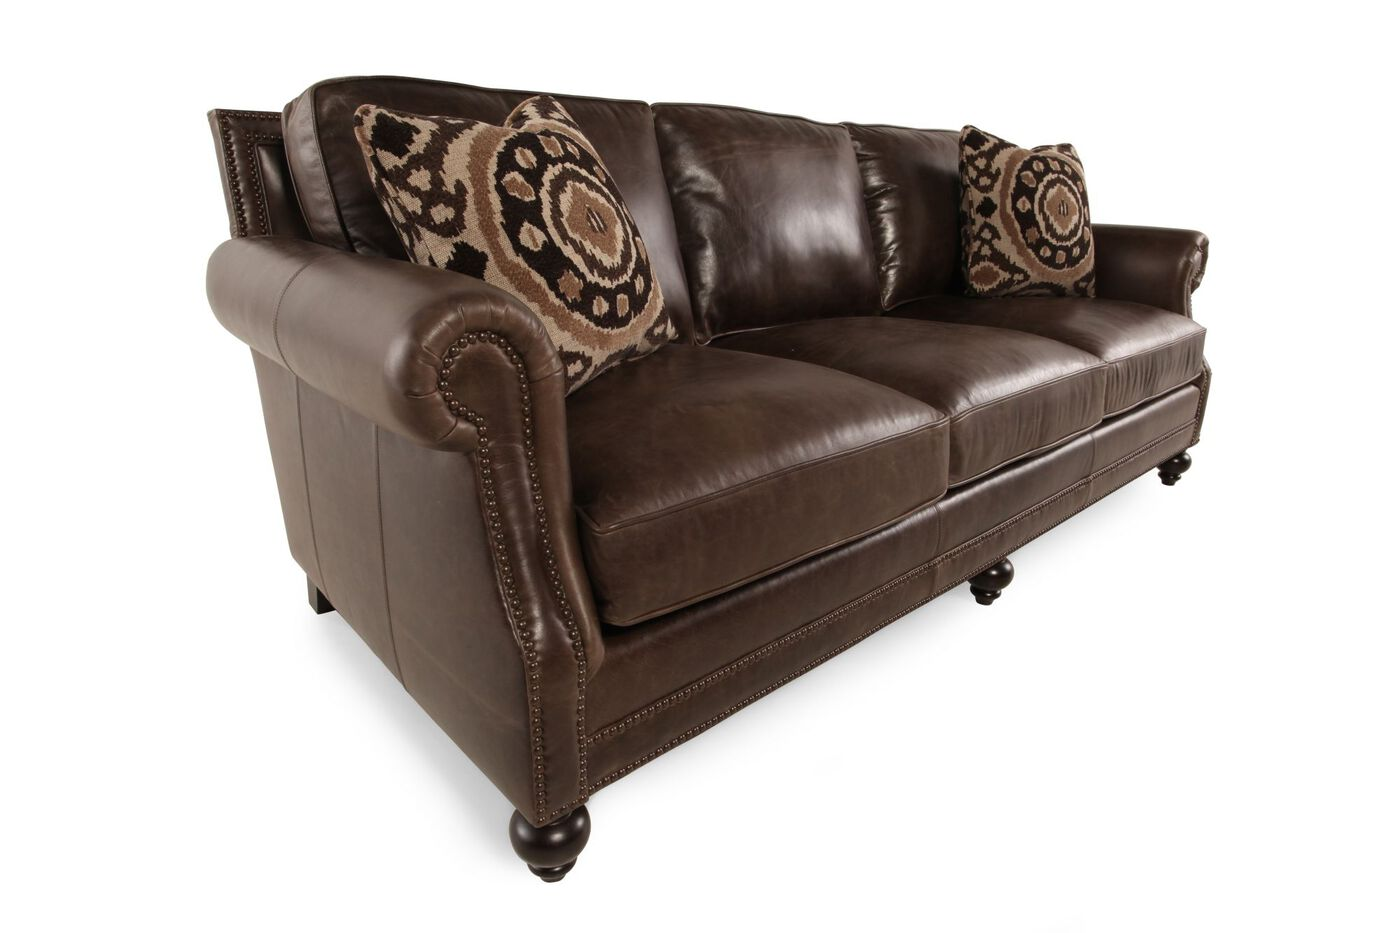 Bernhardt Brae Leather Sofa Mathis Brothers Furniture